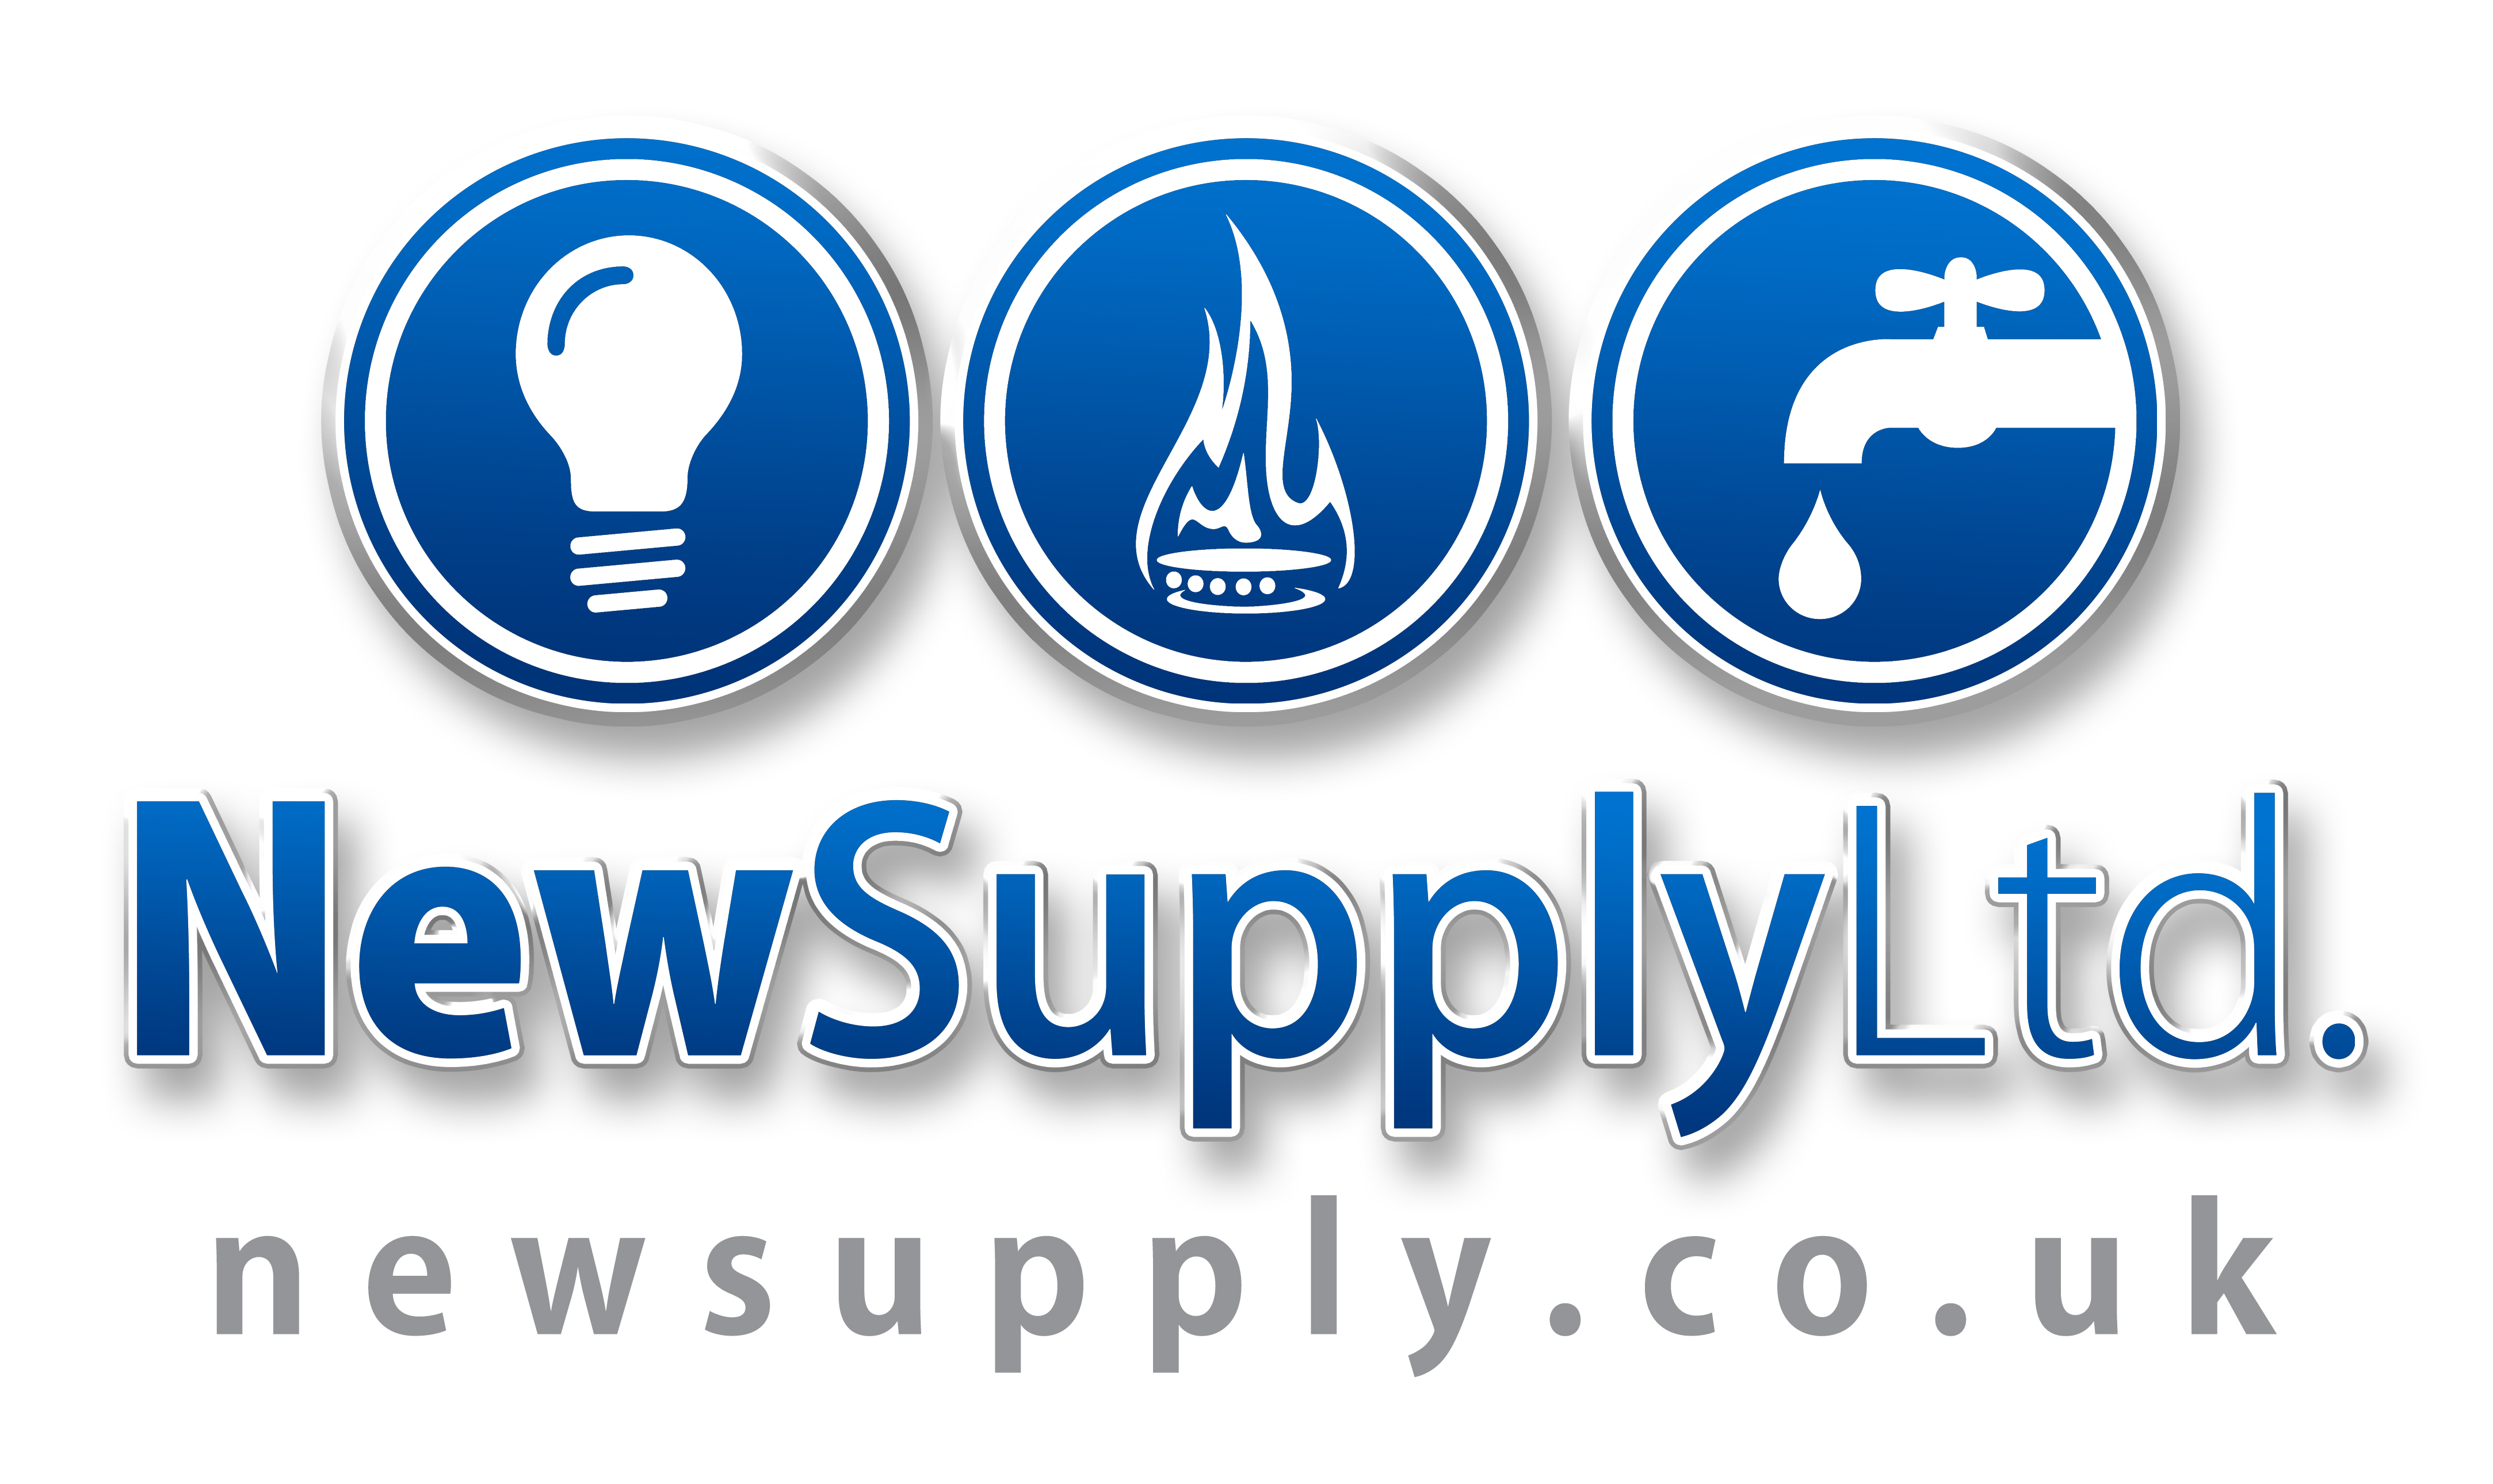 New Supply Ltd logo